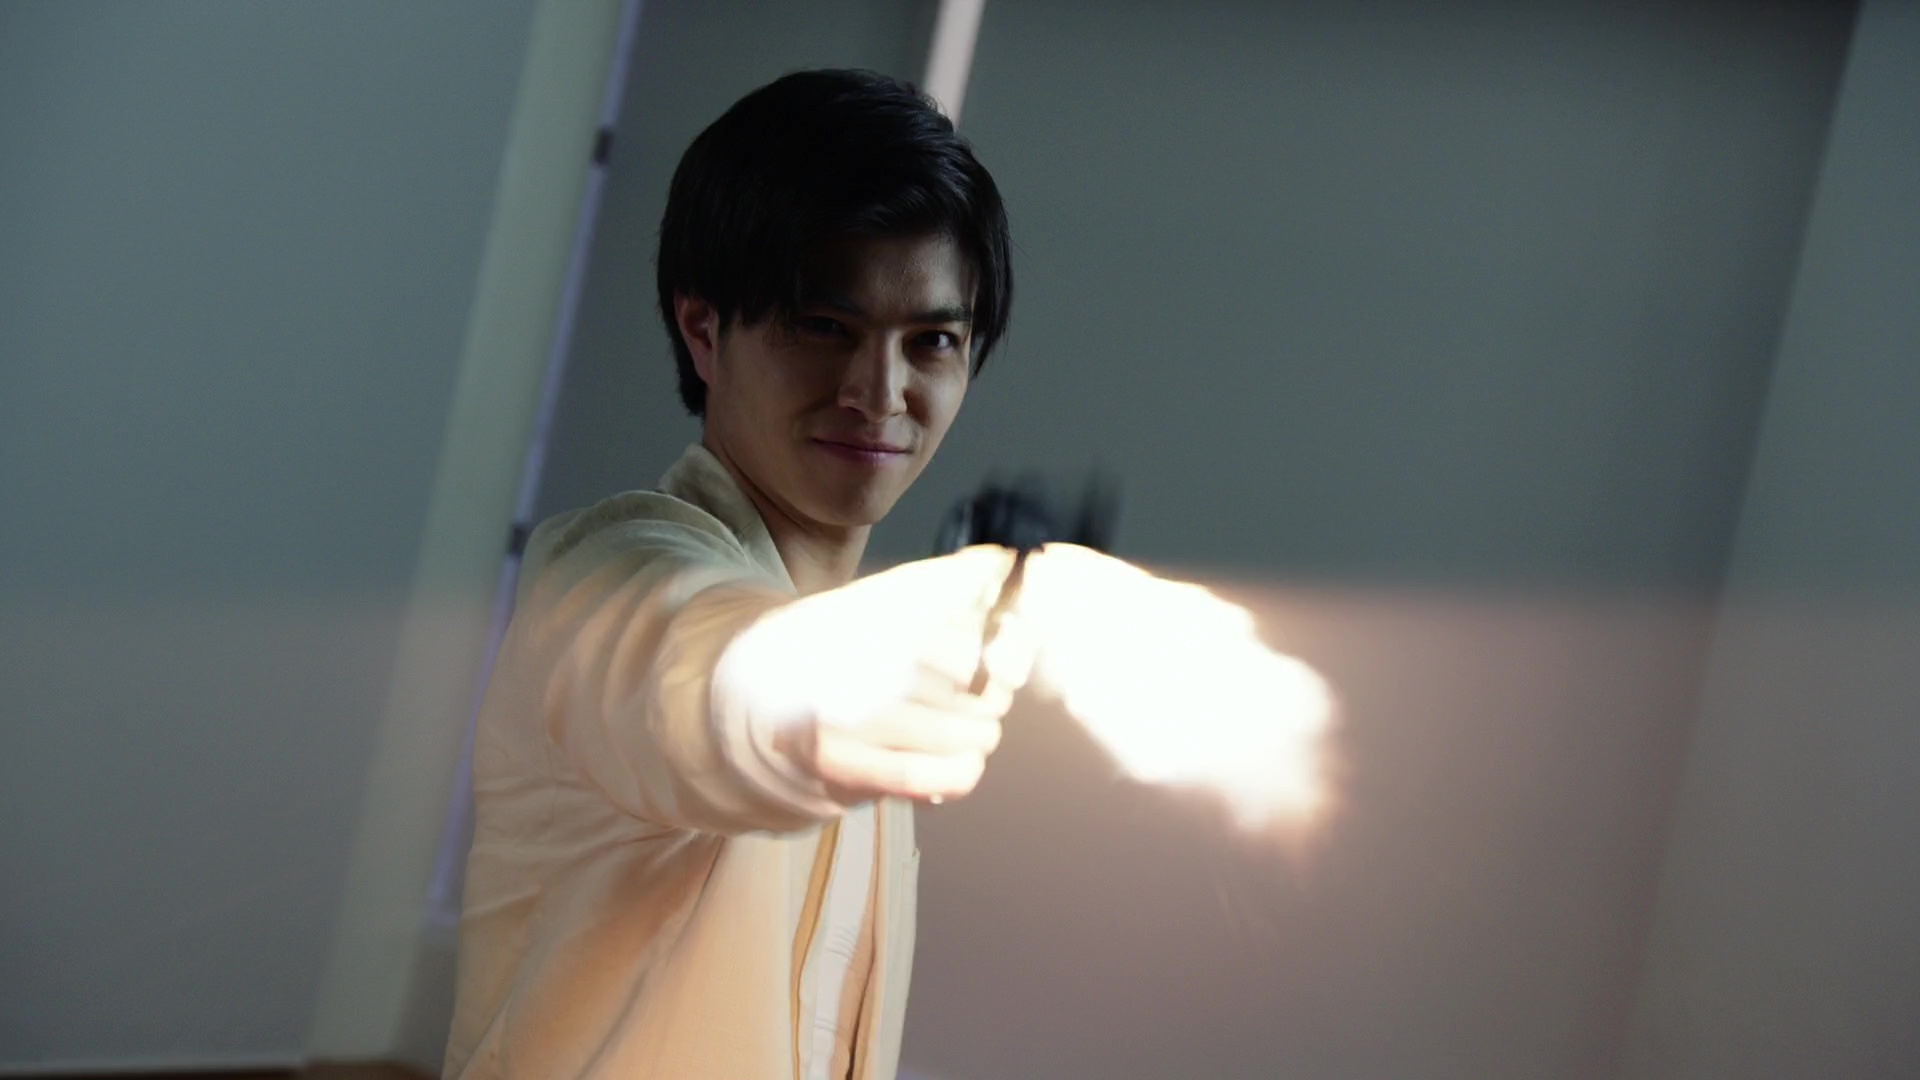 Kamen Rider Zero One Project Thouser Recap